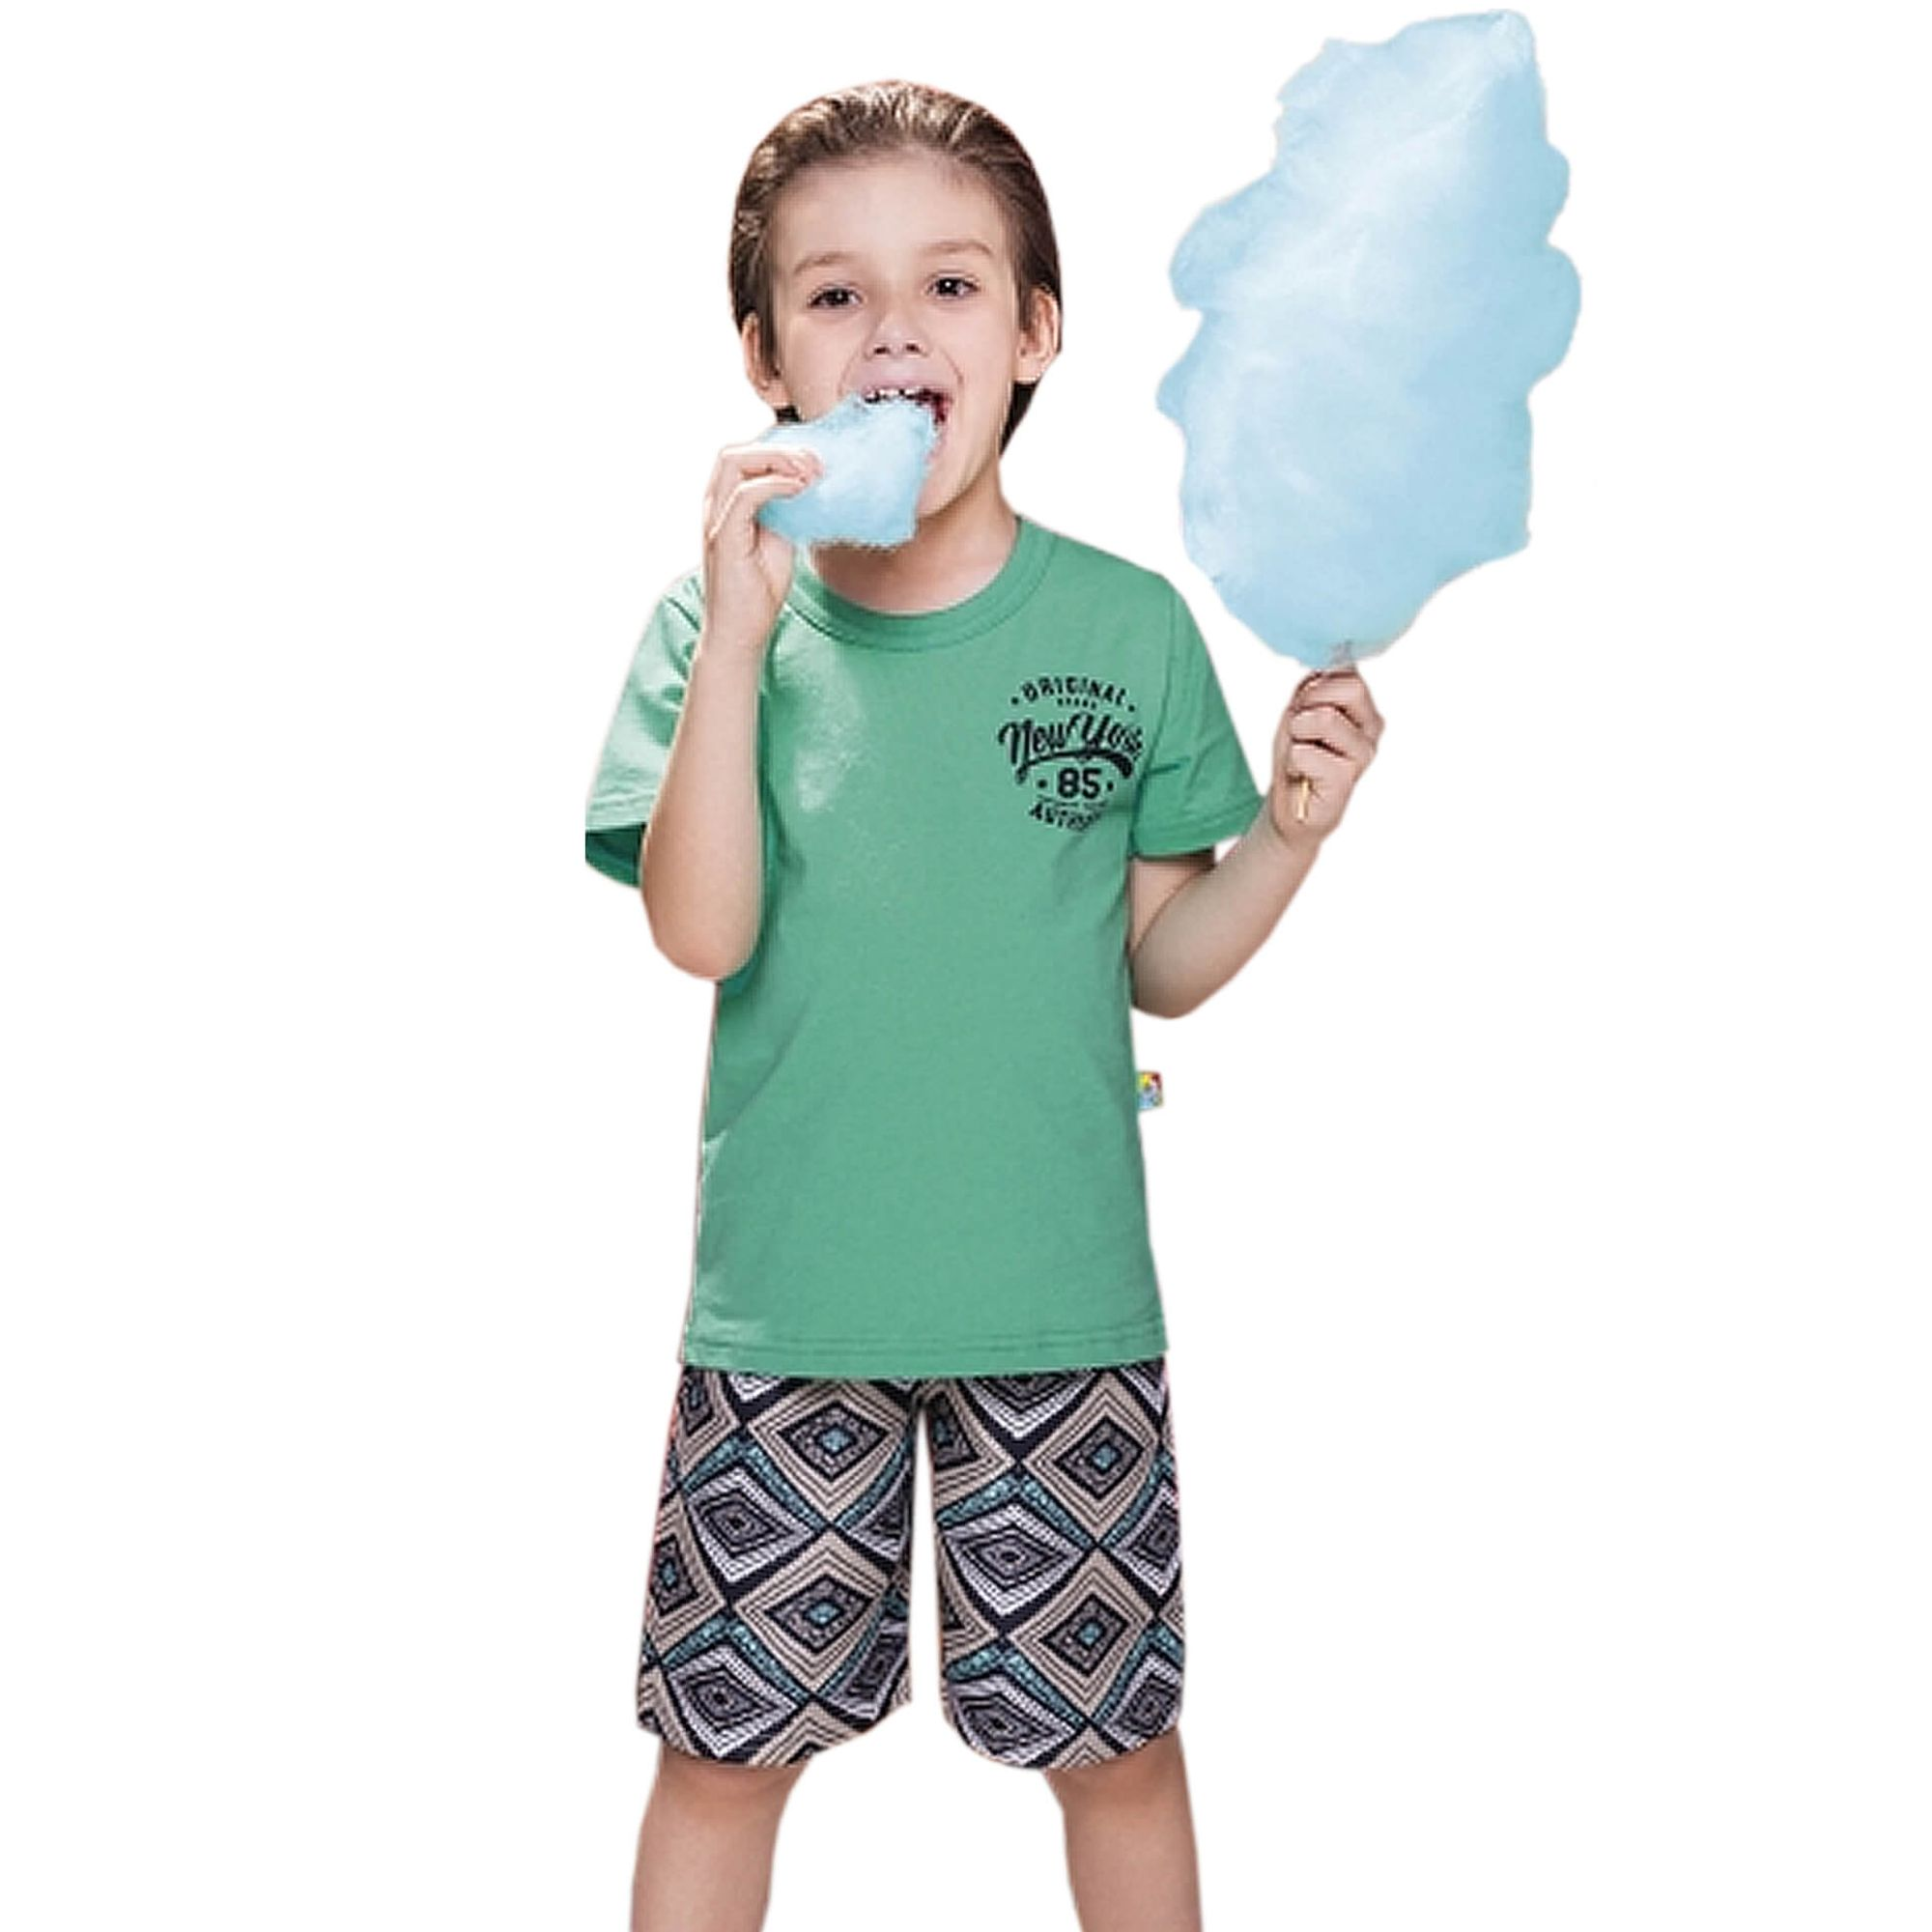 conjunto-menino-camiseta-verde-new-york-e-bermuda-microfibra-1